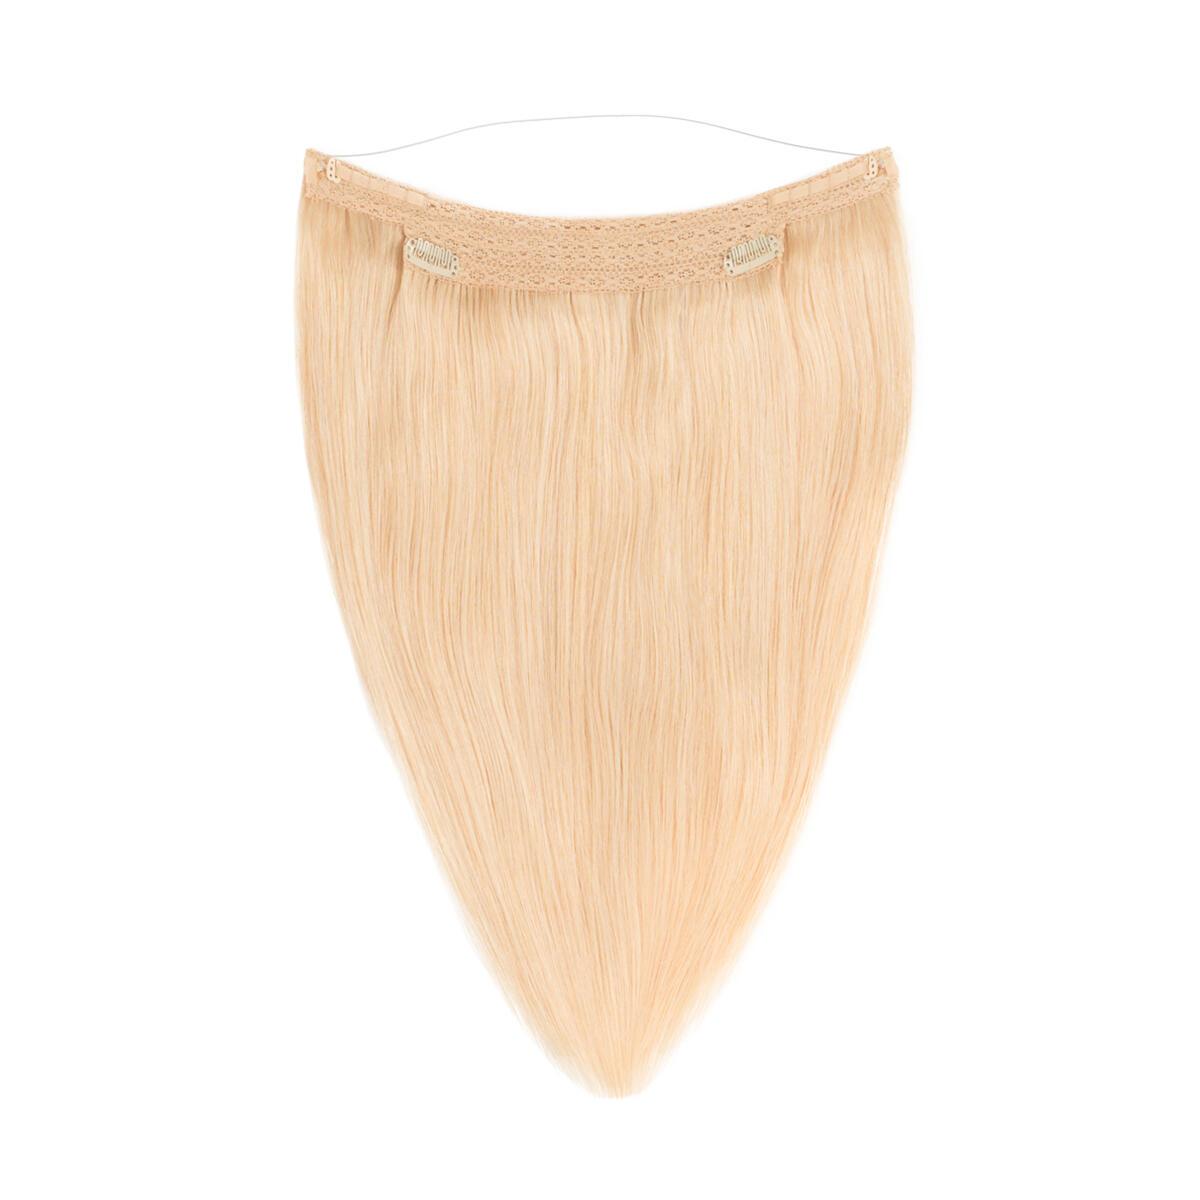 Hairband Original 8.3 Honey Blonde 45 cm